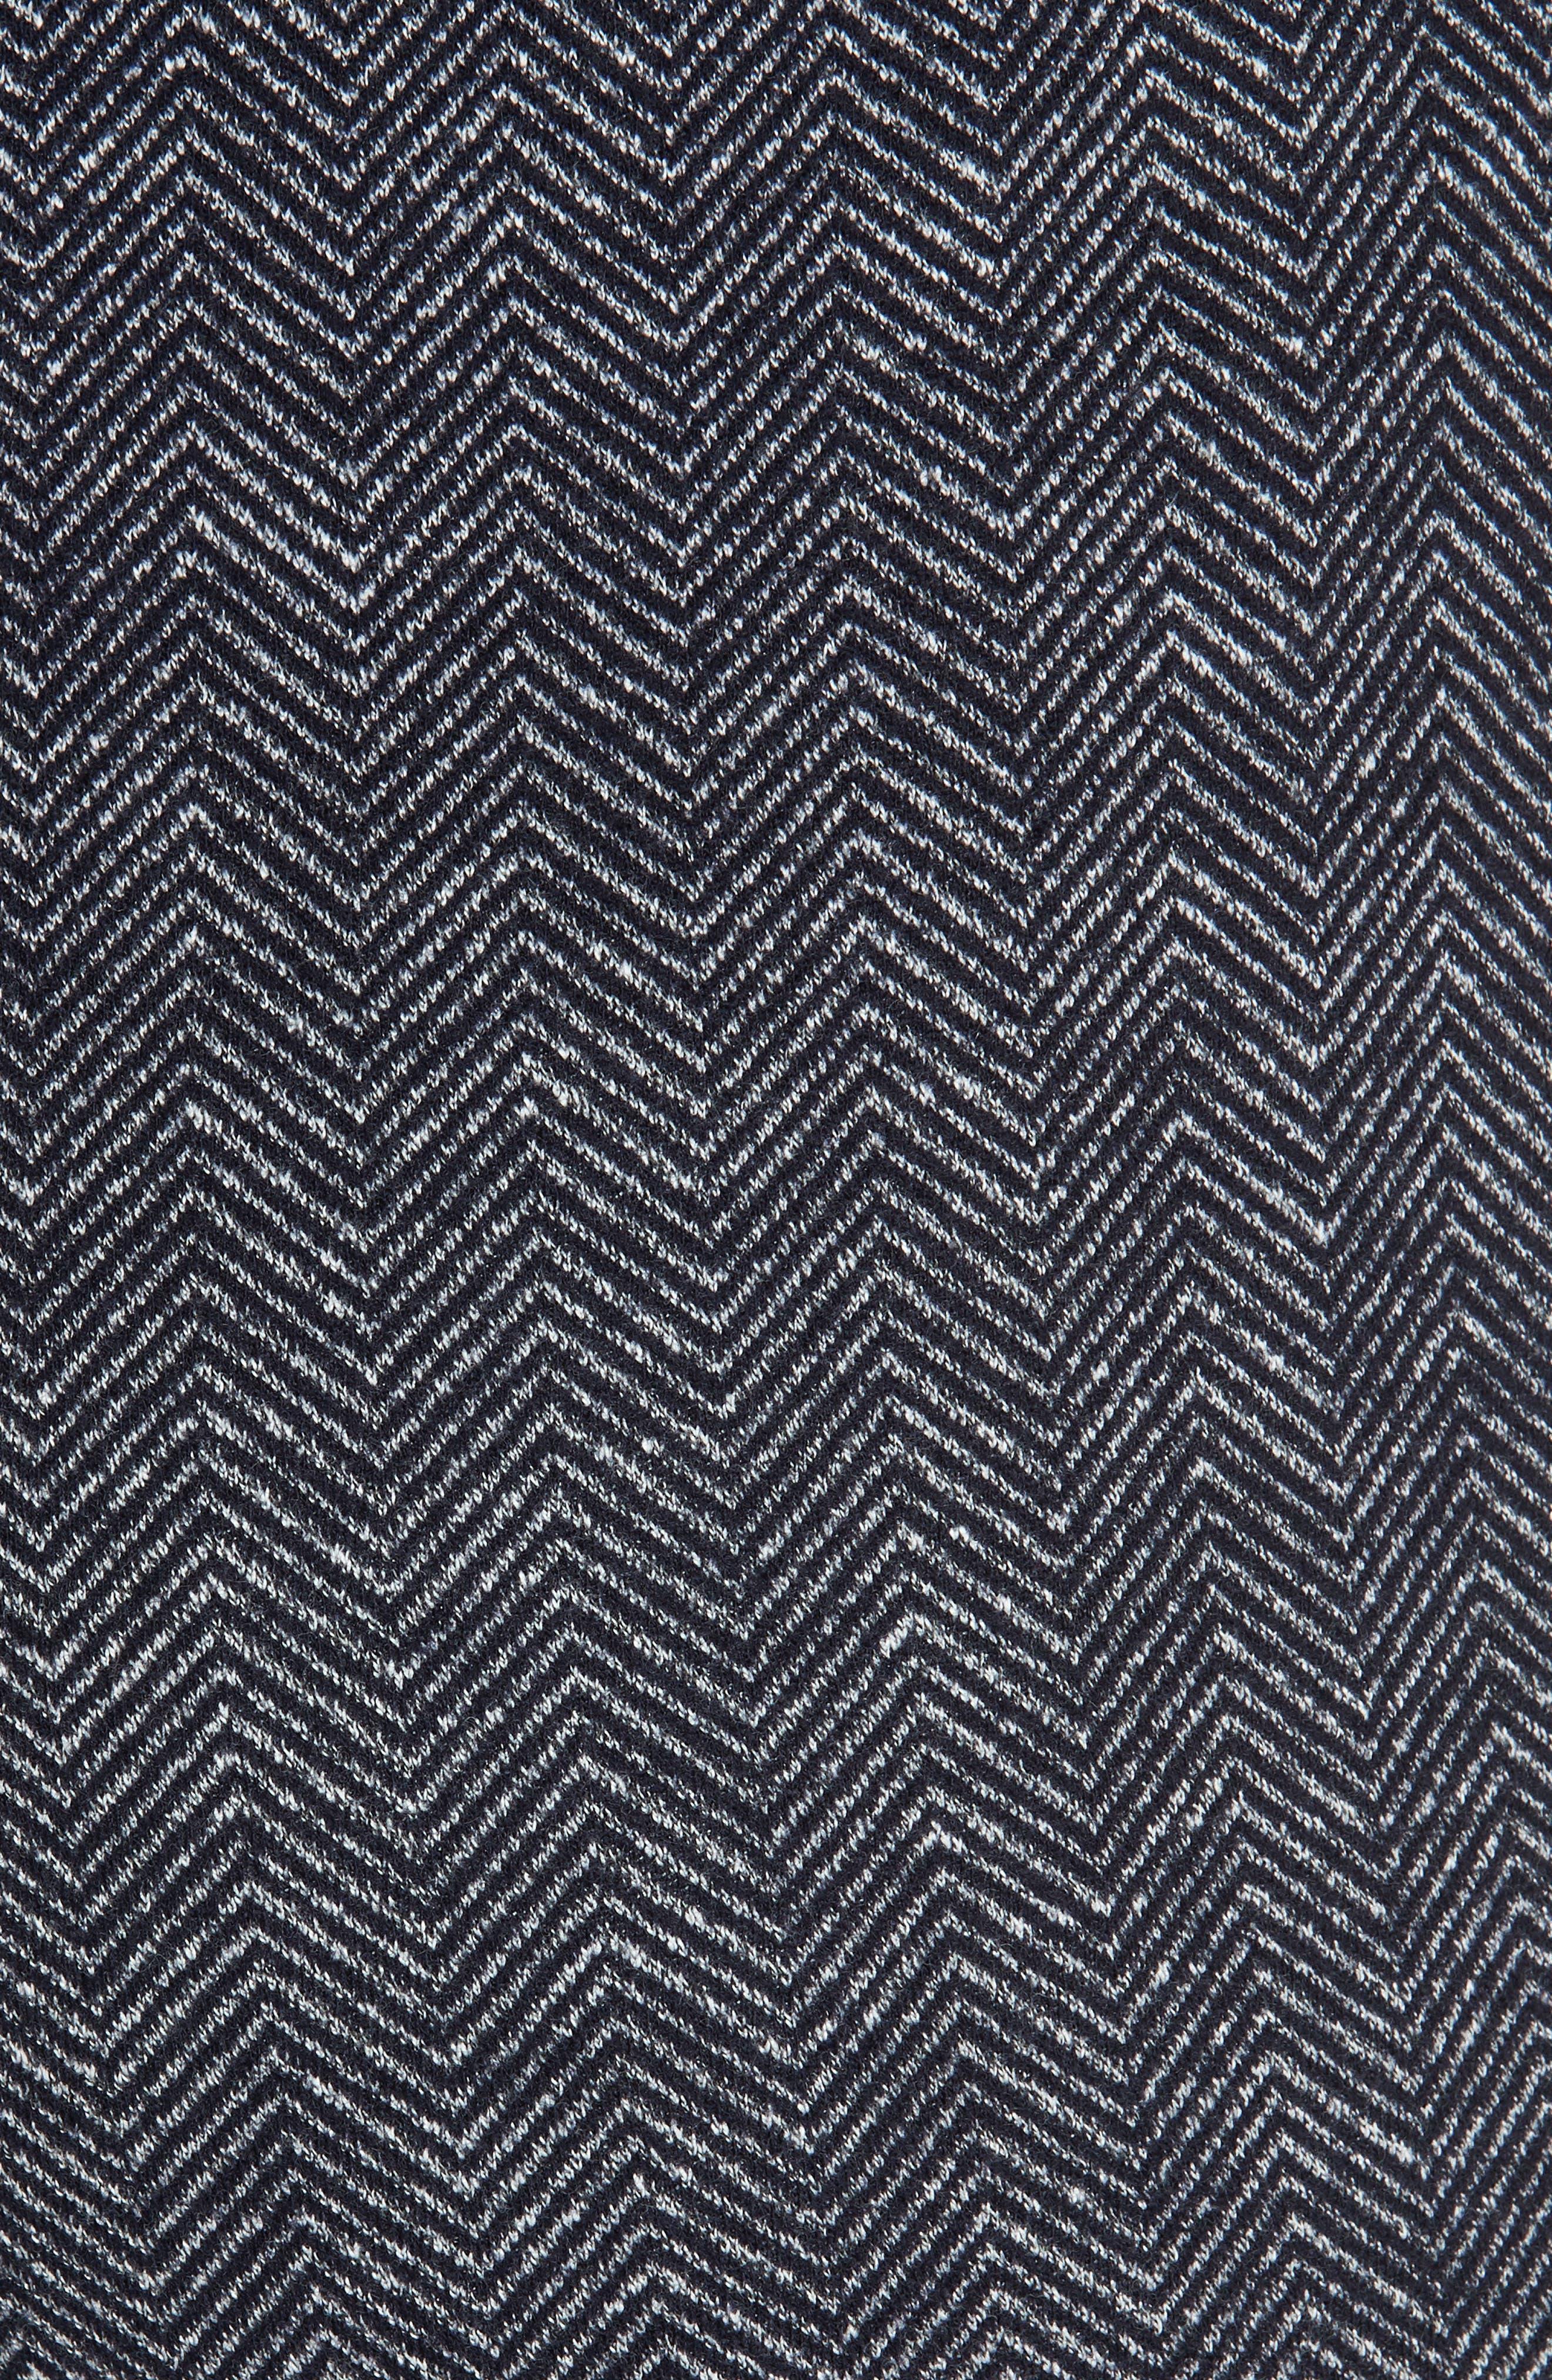 Talbert Chevron Knit Wide Leg Pants,                             Alternate thumbnail 5, color,                             NAVY MULTI